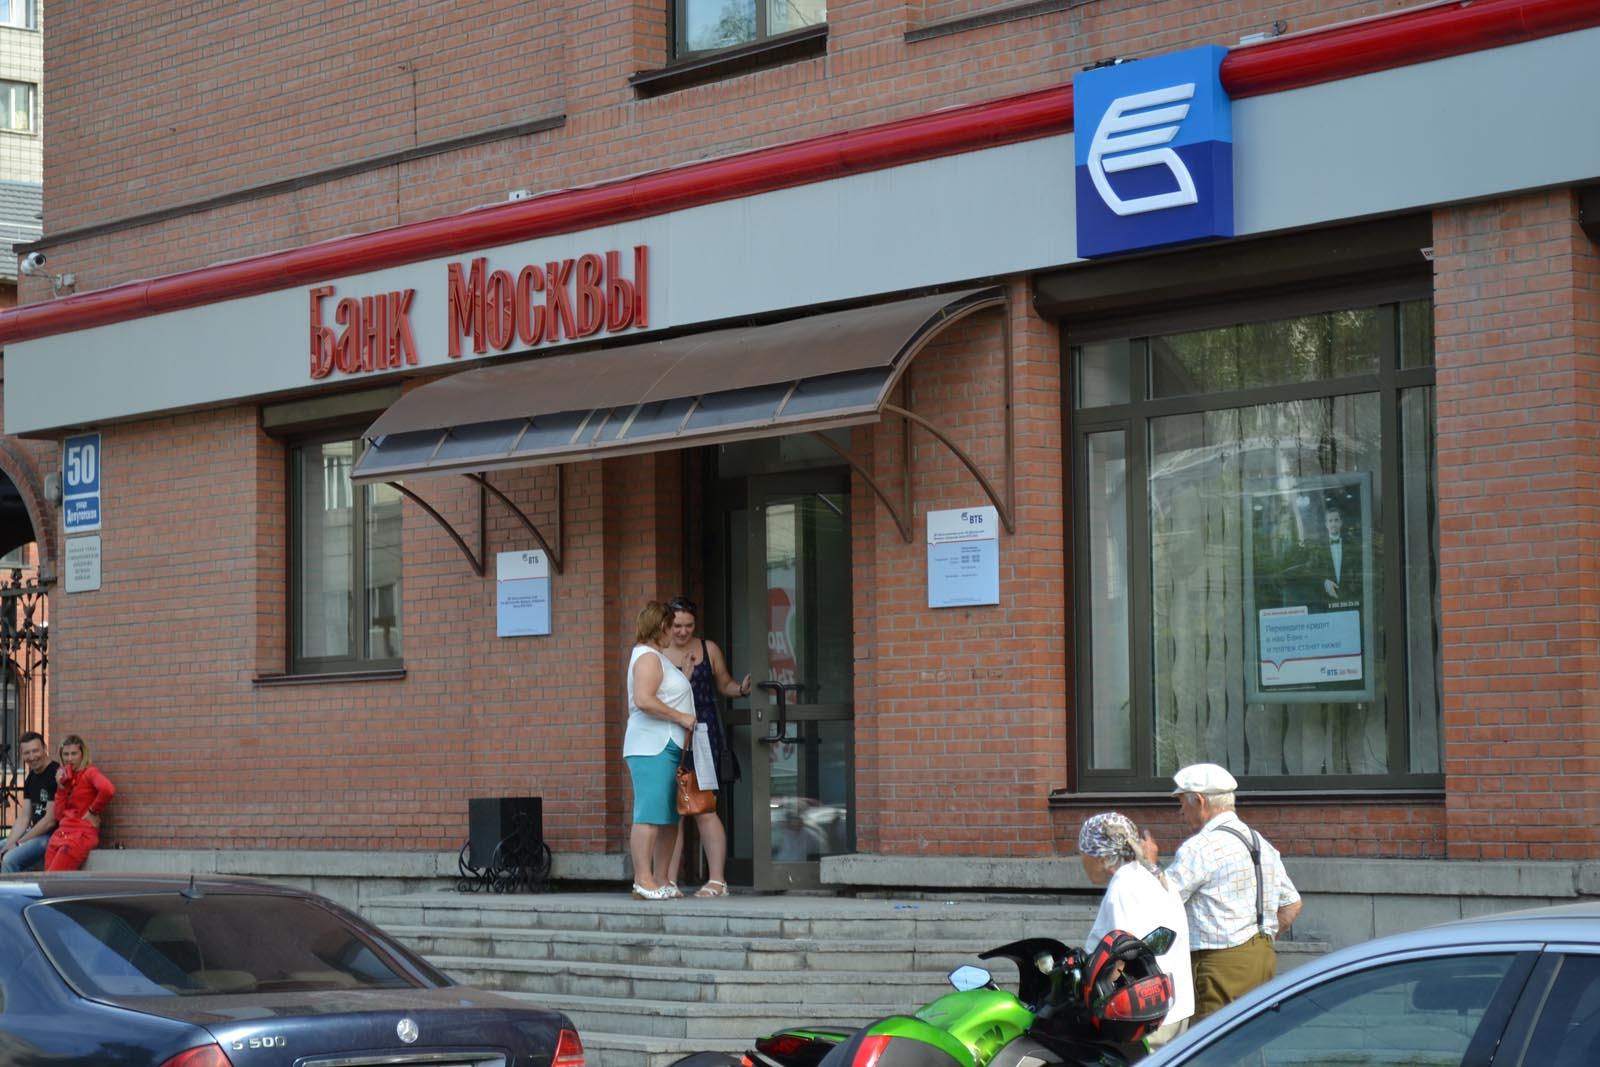 VTB Bank Moskvi otdelenie